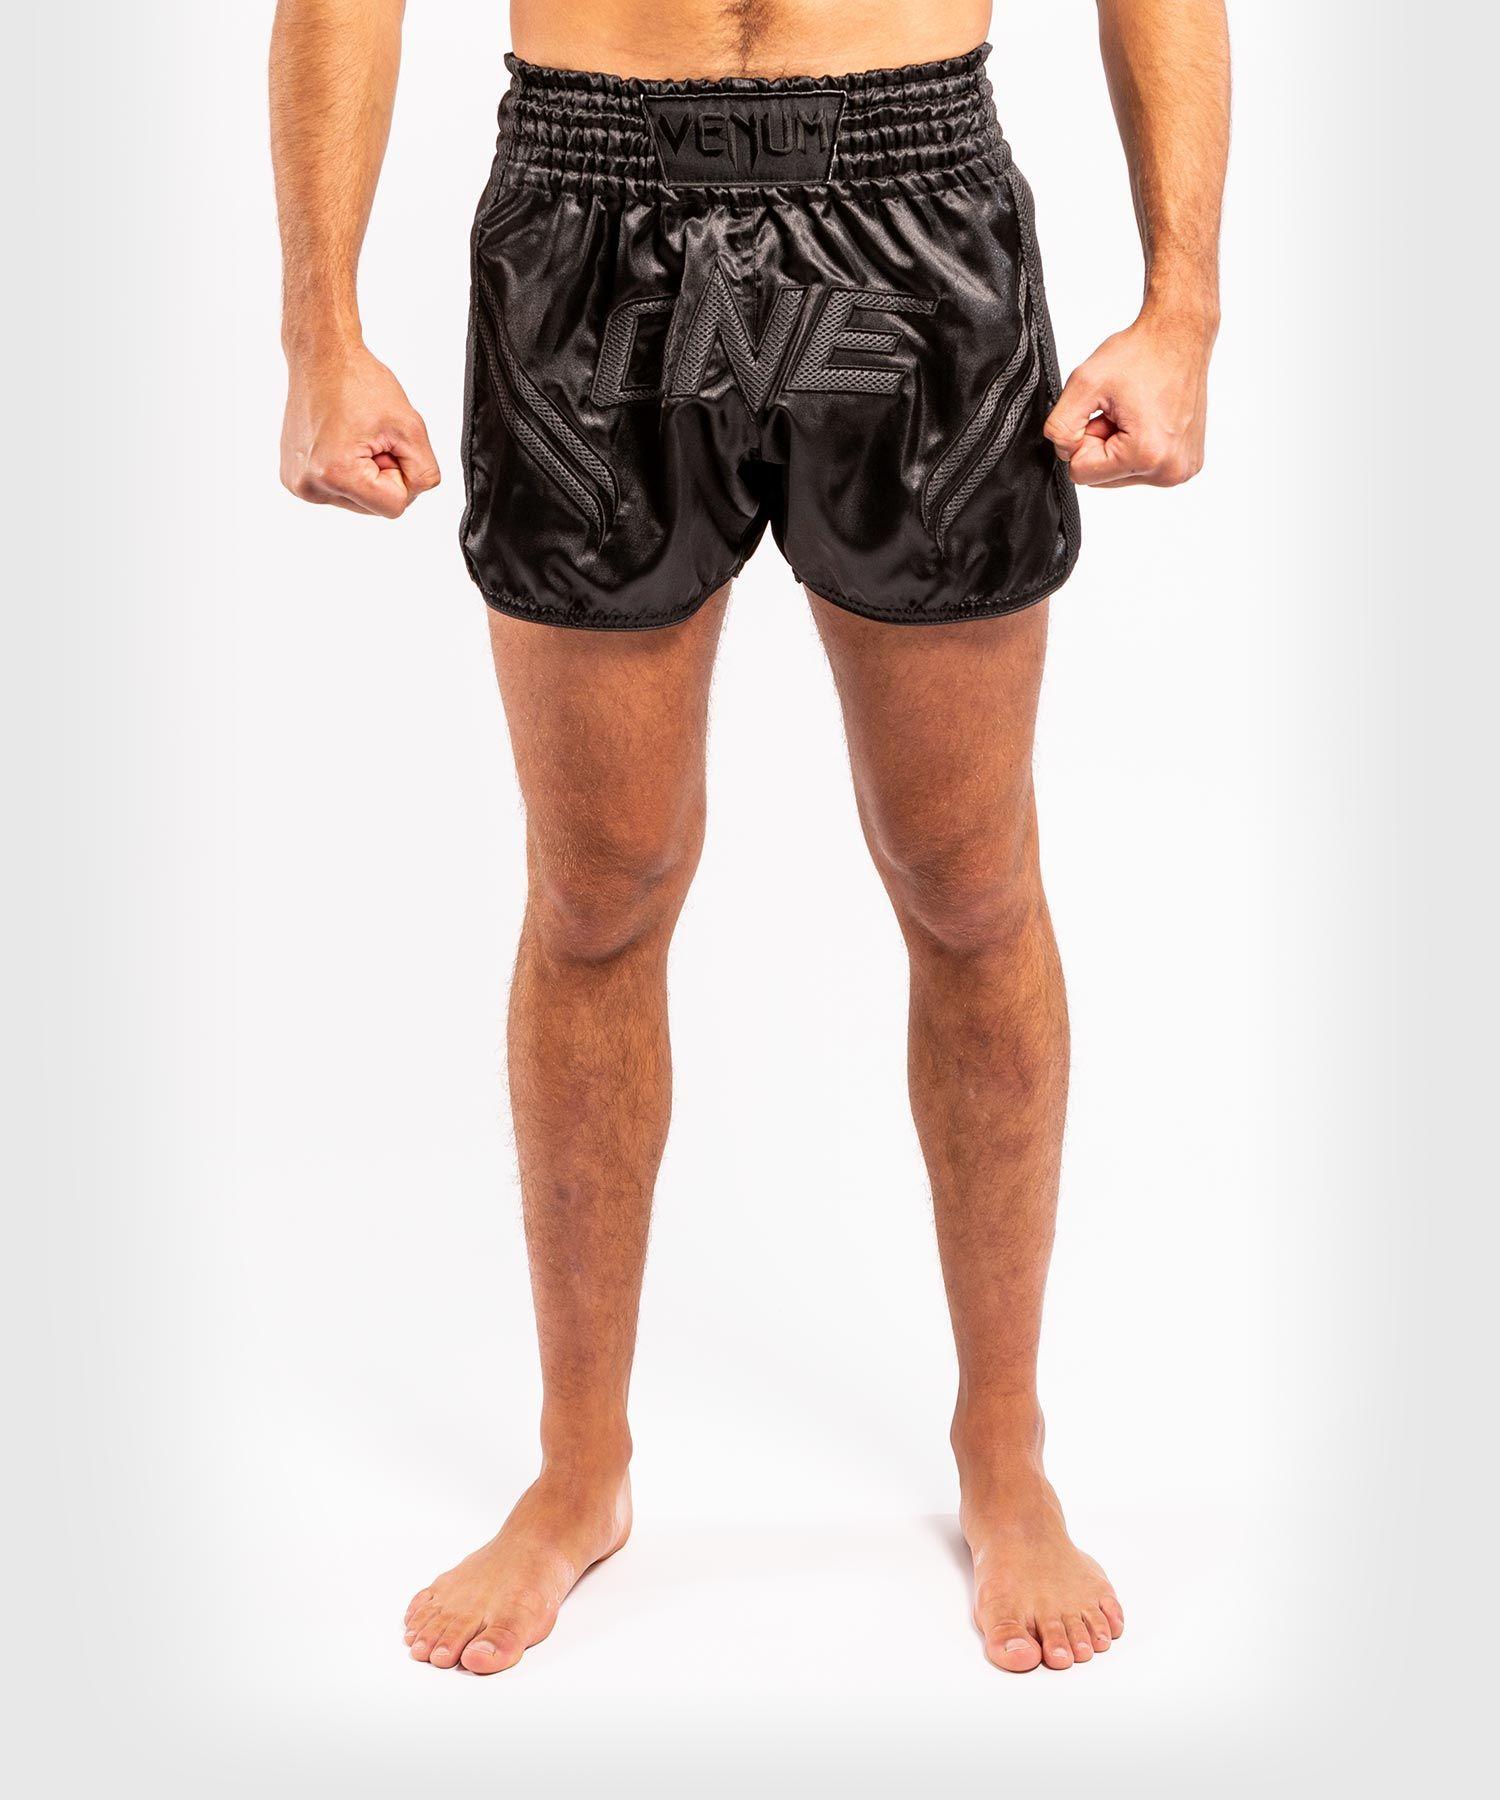 Venum ONE FC Impact Muay Thai Shorts - Black/Black